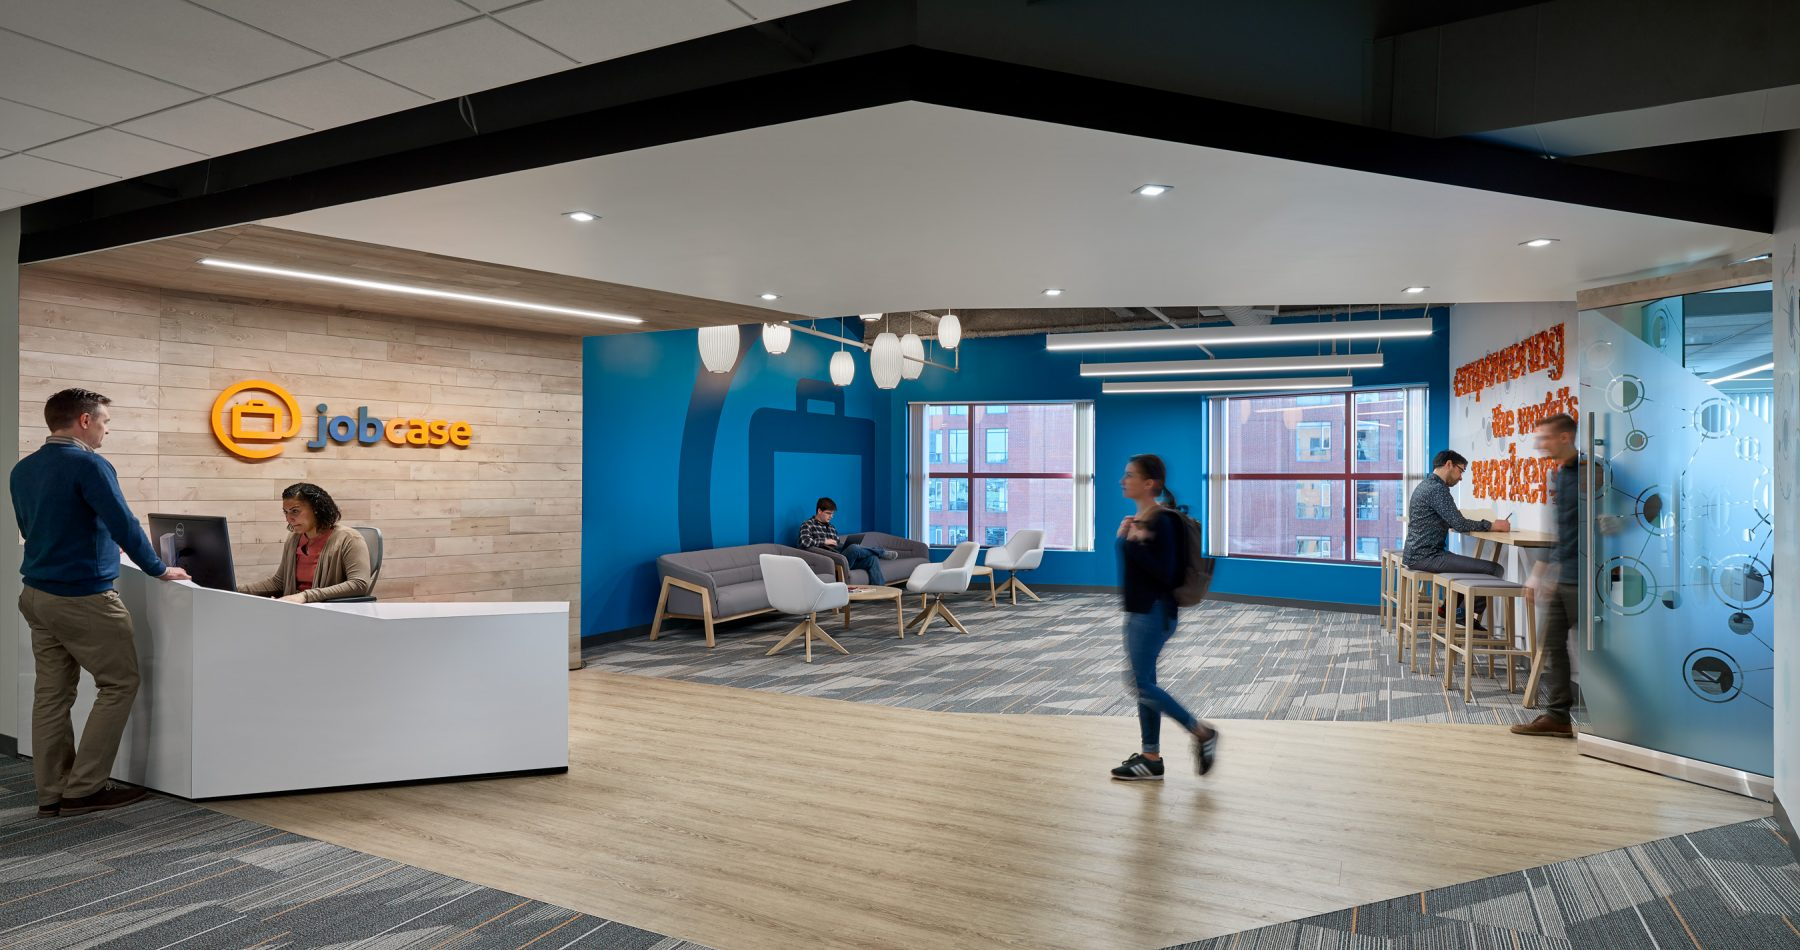 Fusion Jobcase Lobby Overall Small